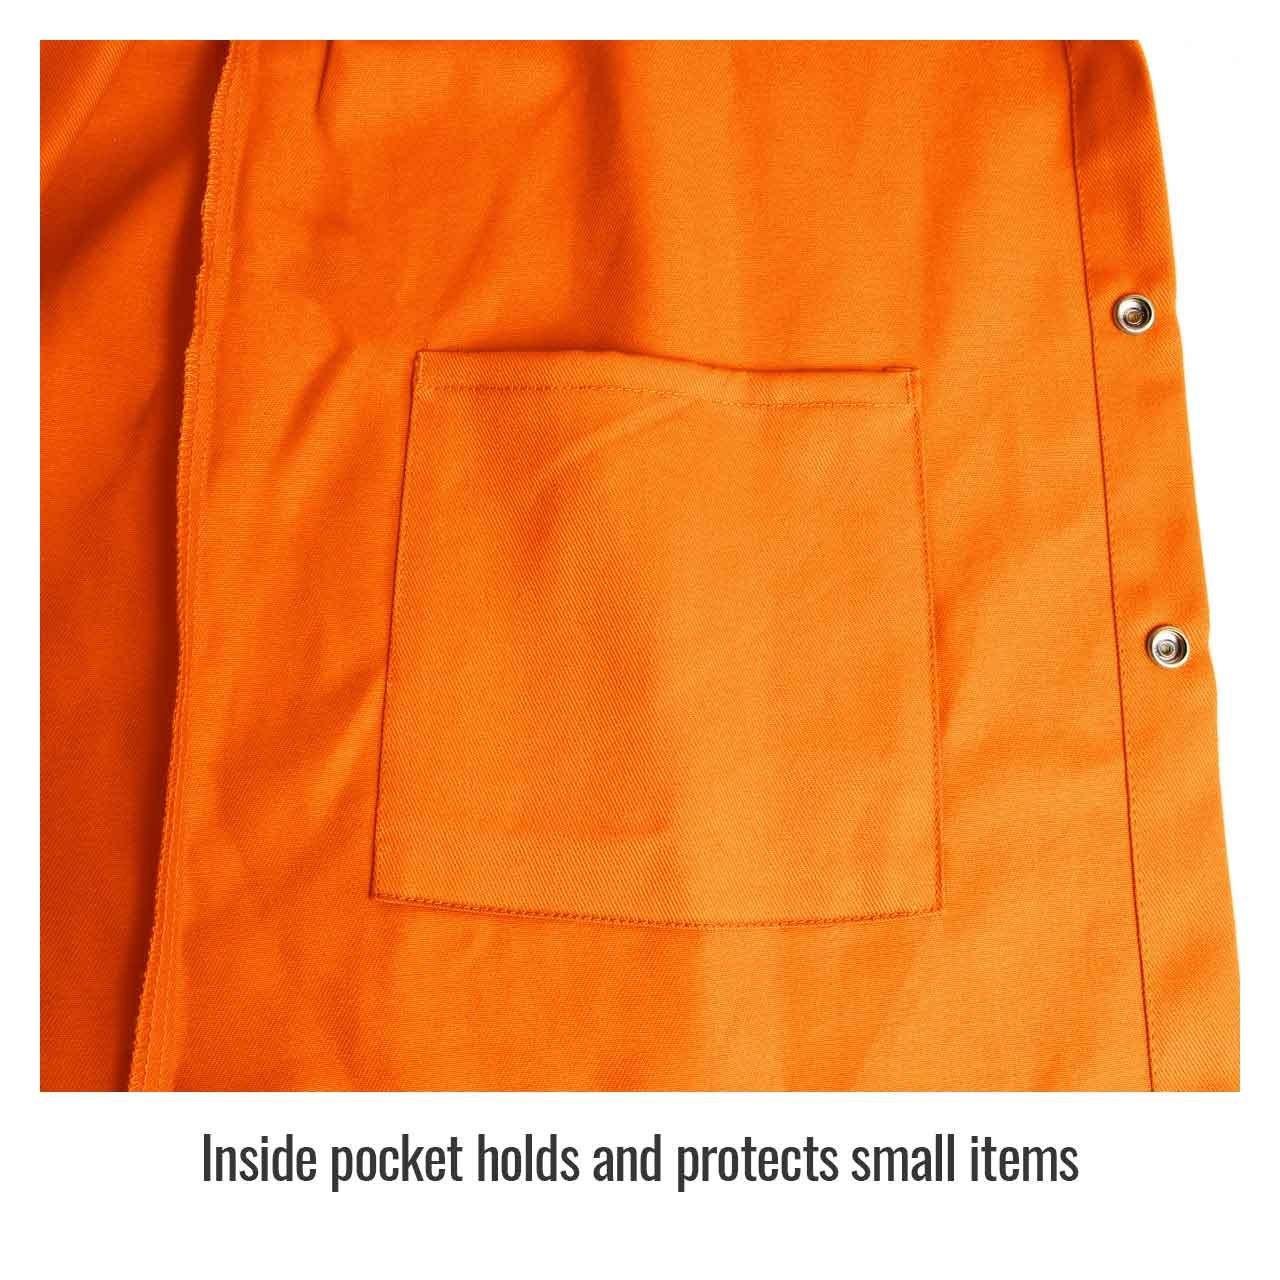 Black Stallion FO9-30C 30 9oz Mediu Revco F09-30C-Medium Orange FR Cotton Welding Jacket